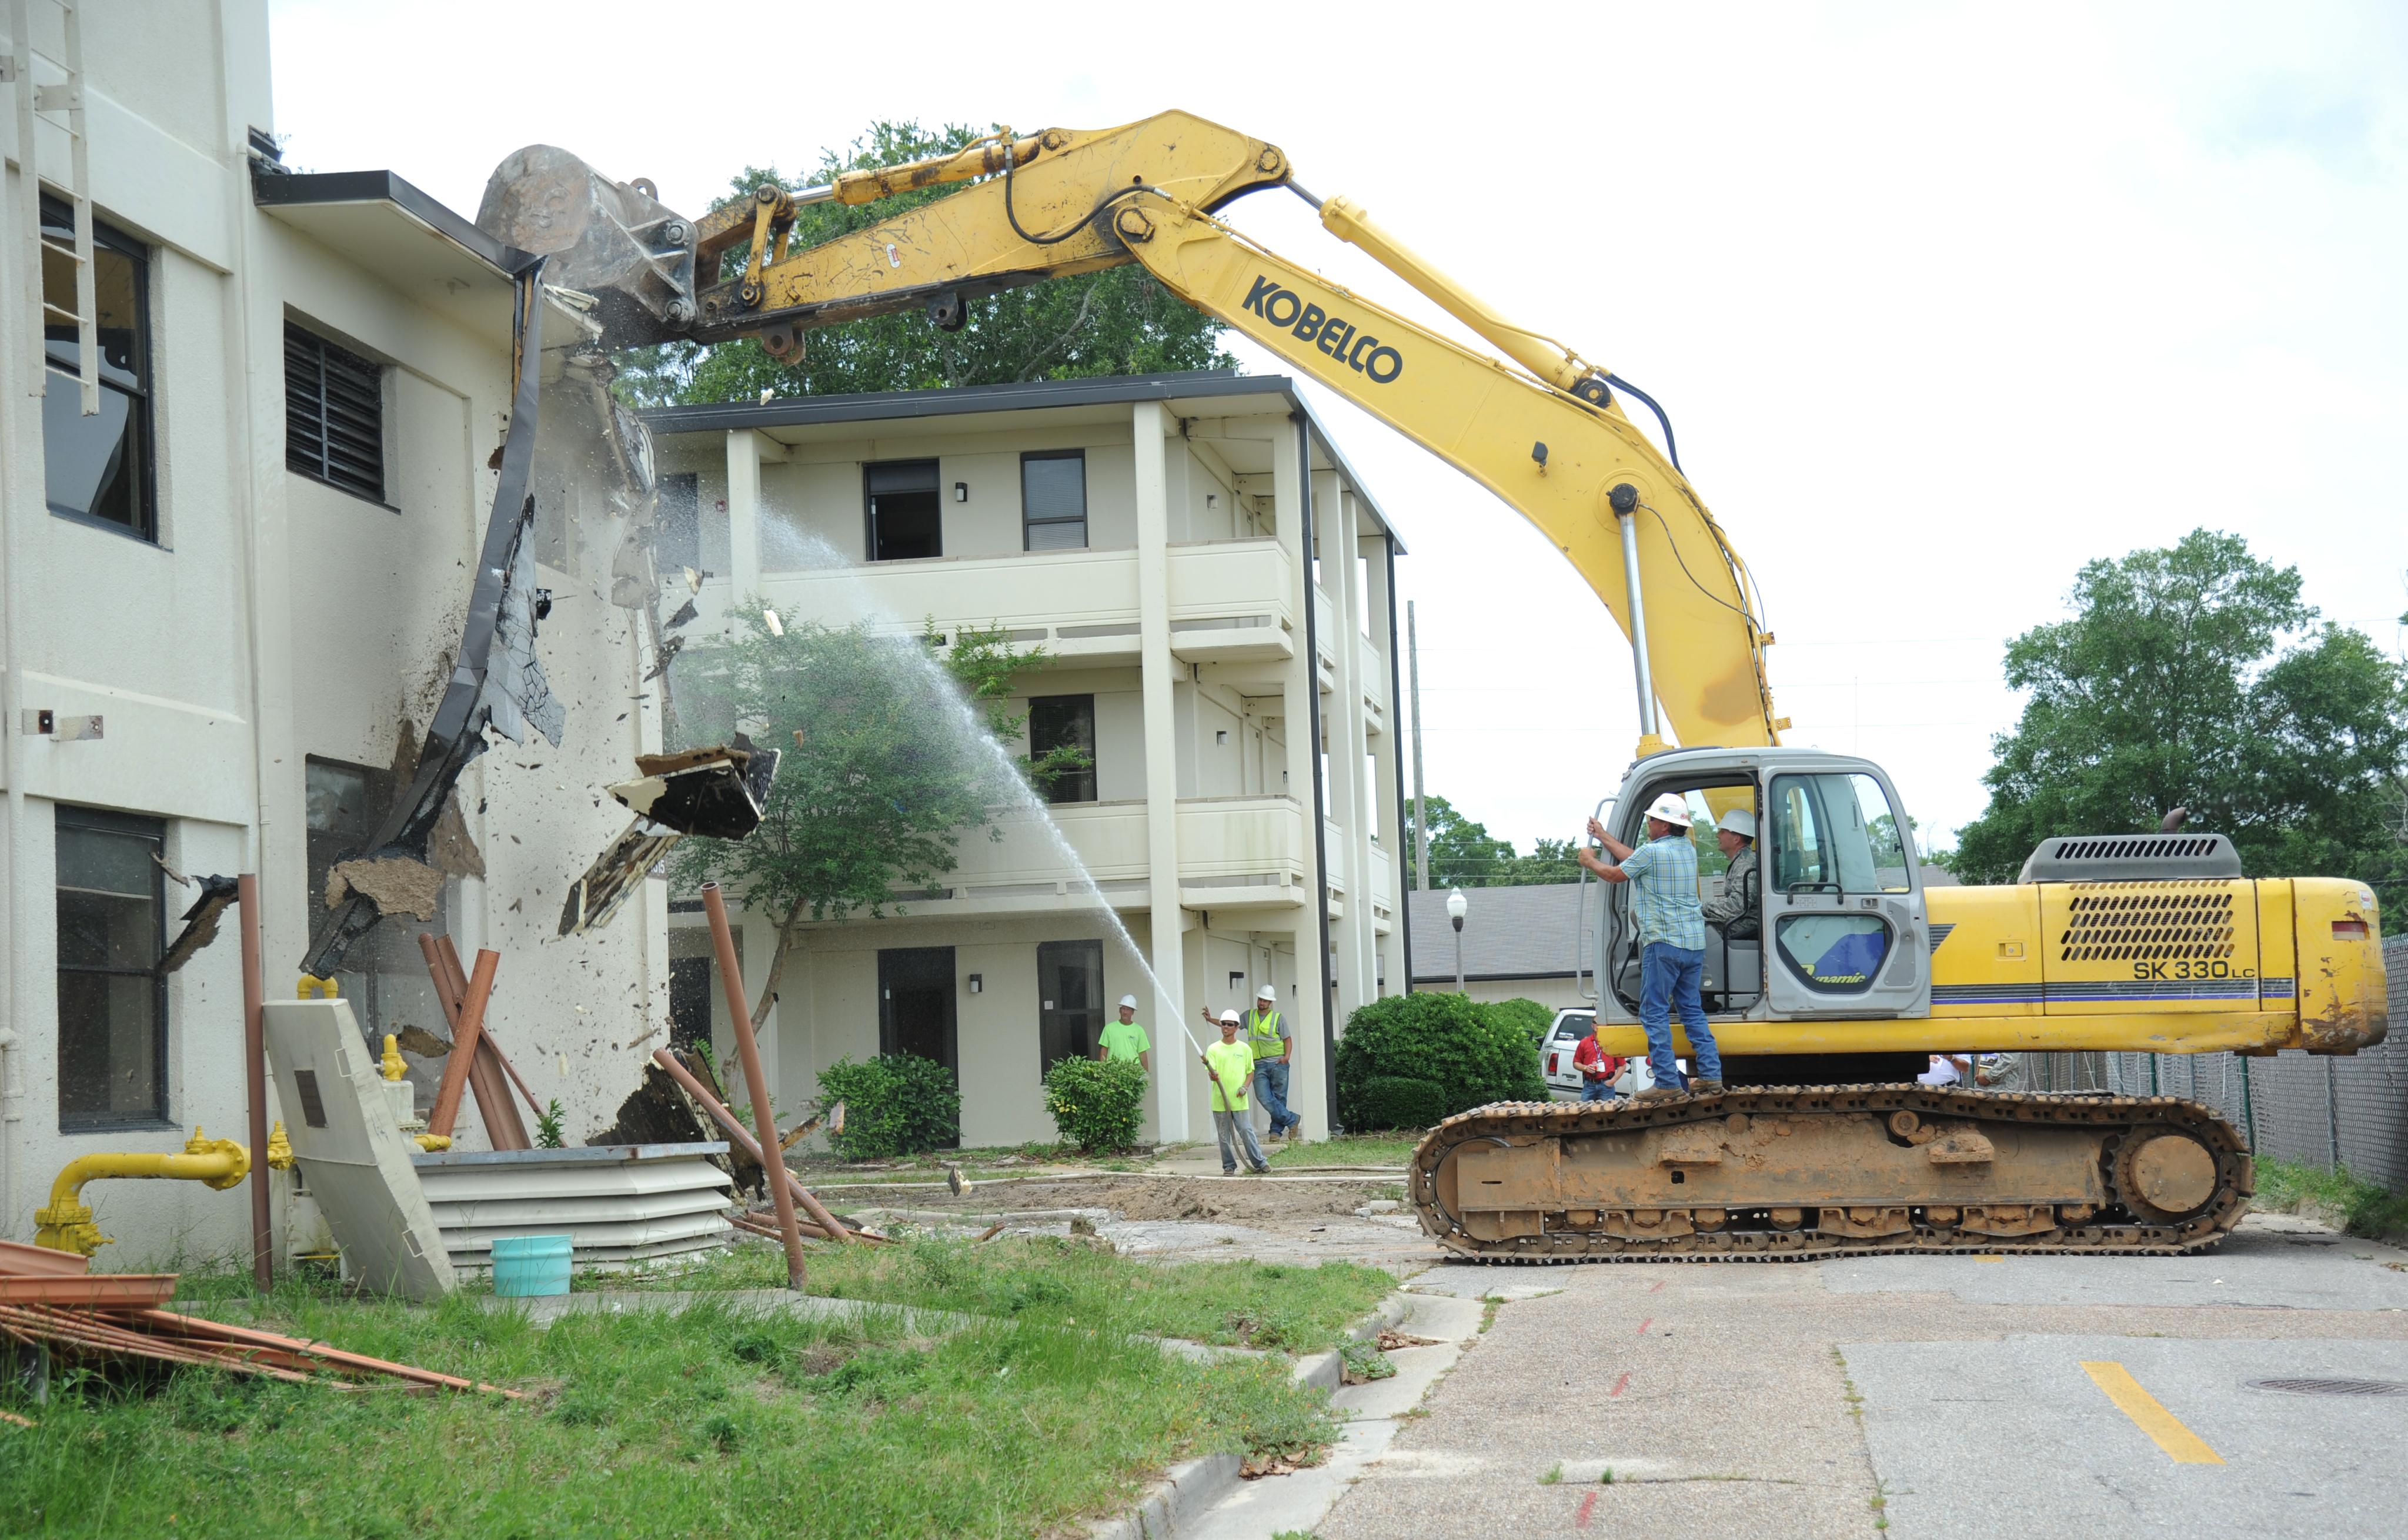 Keesler demolitions reduce costs, save energy > Keesler Air Force